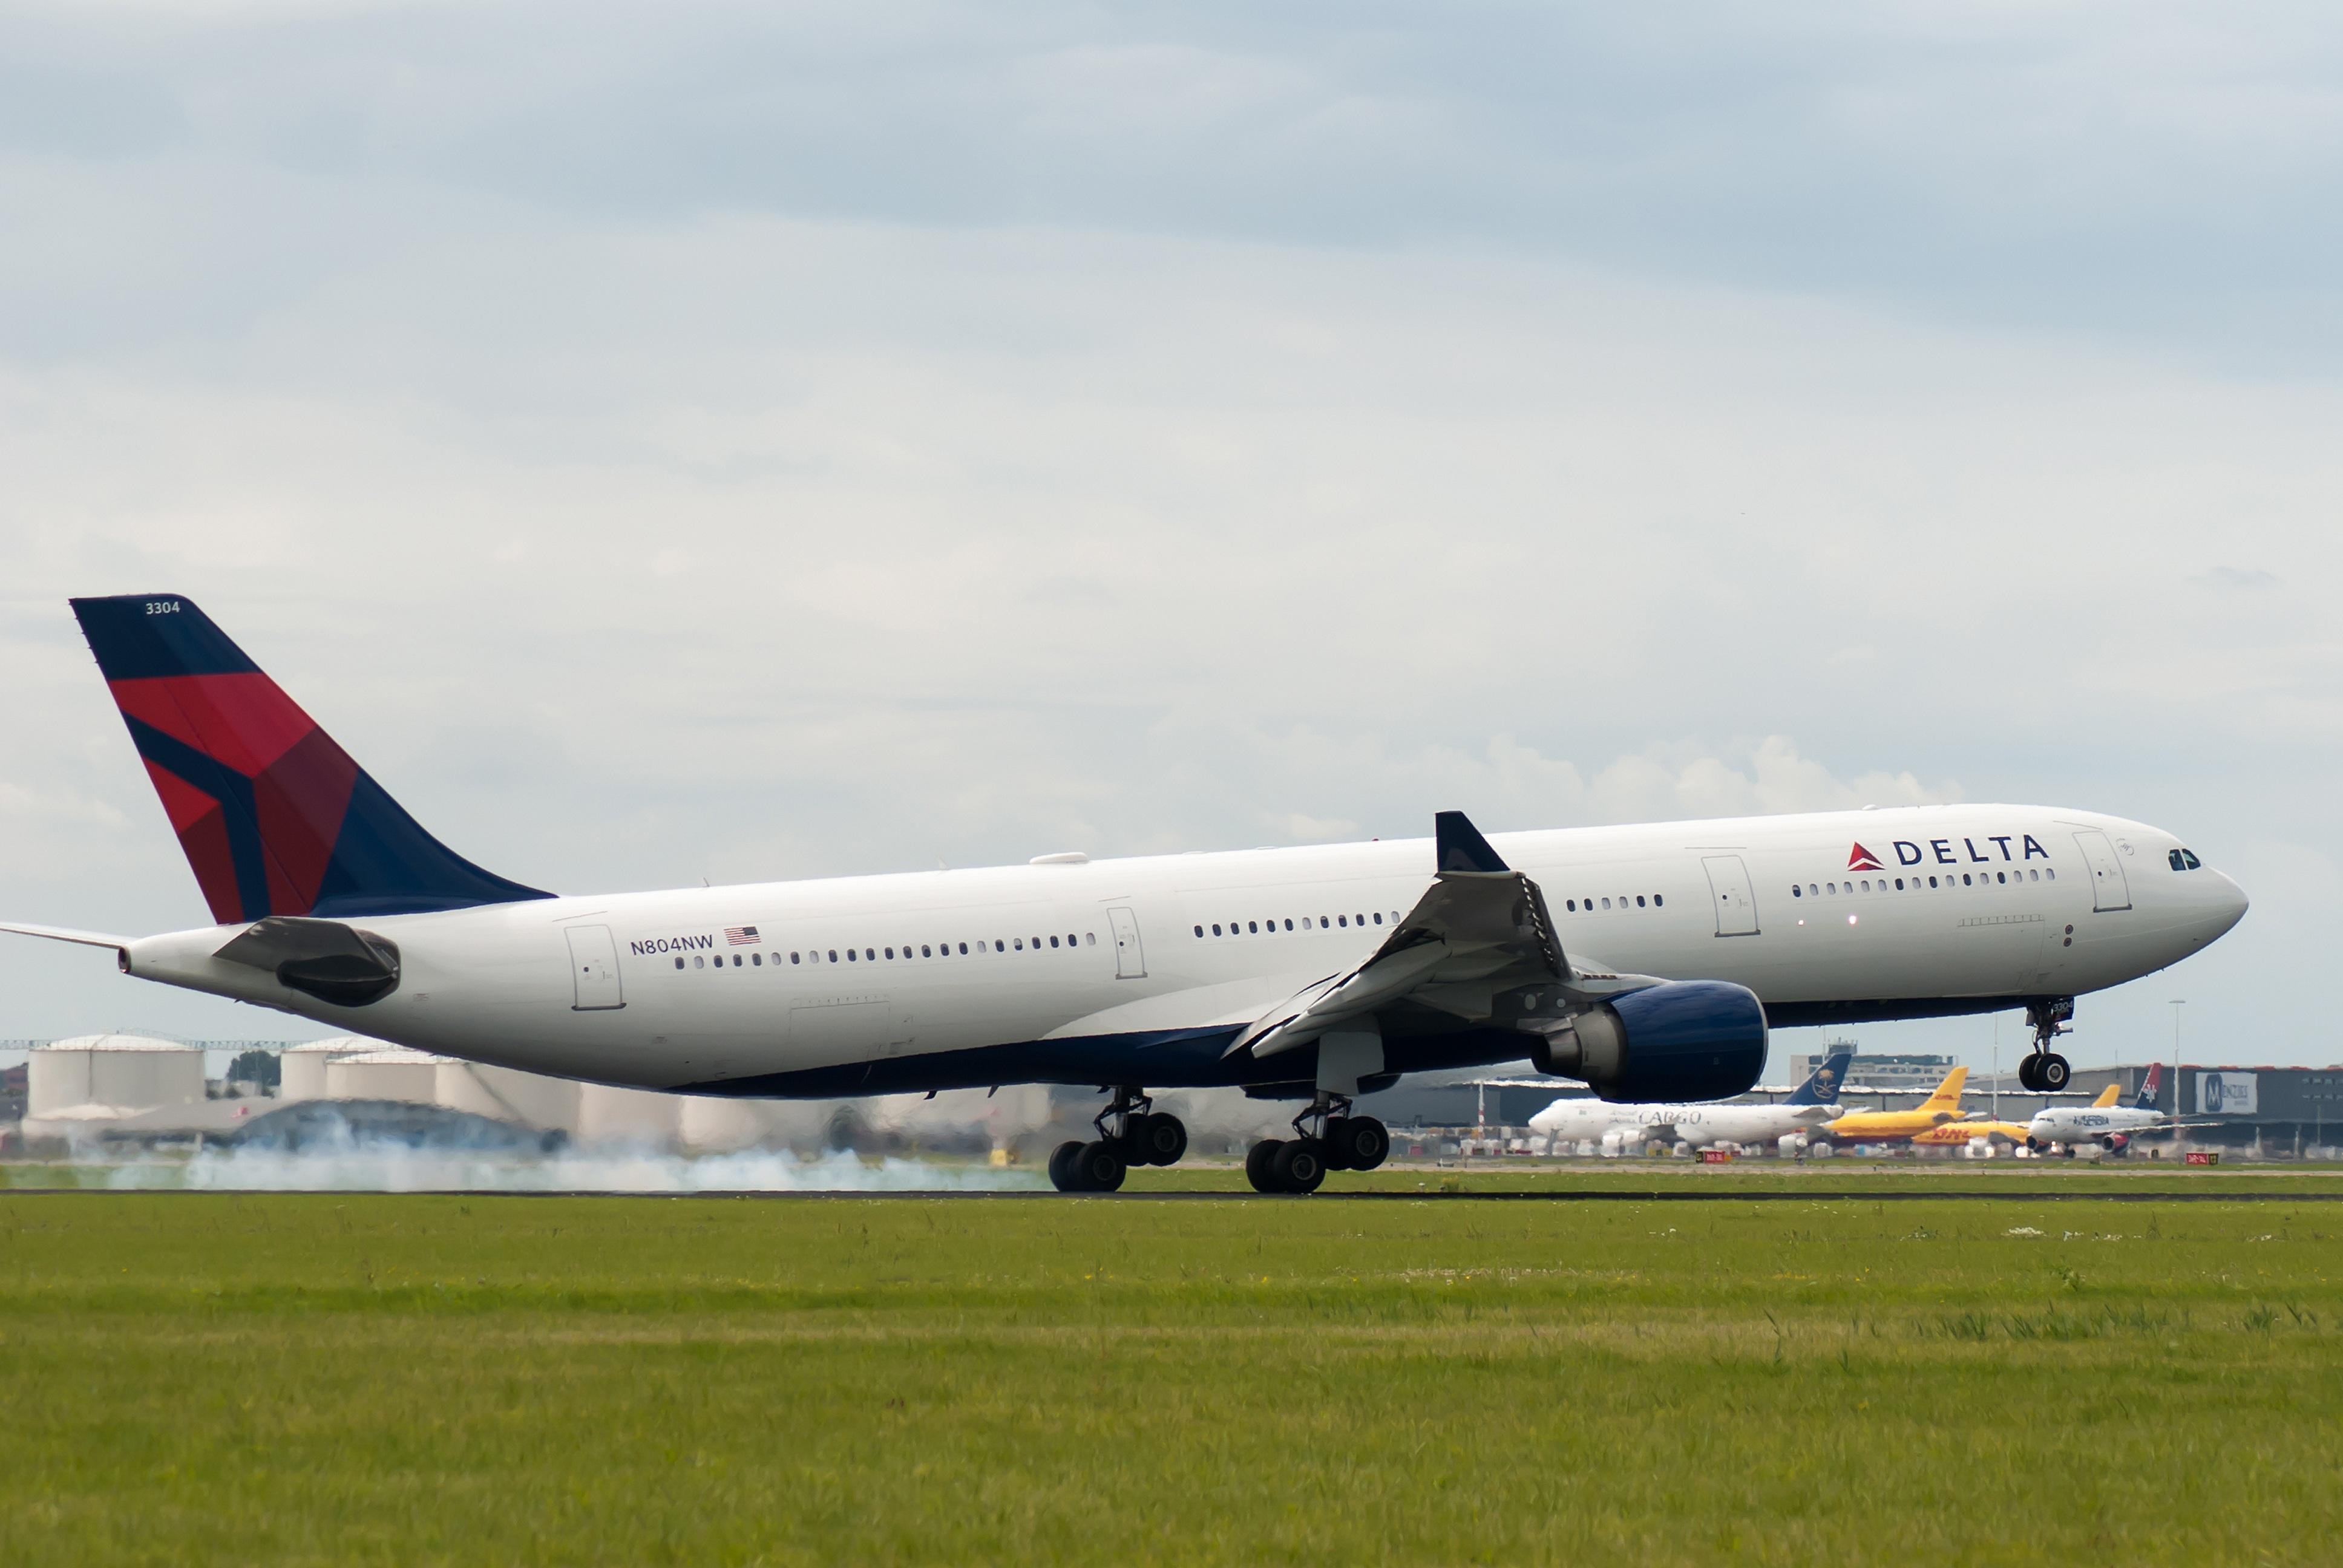 Delta Announces Positive Updates For Medallion Members